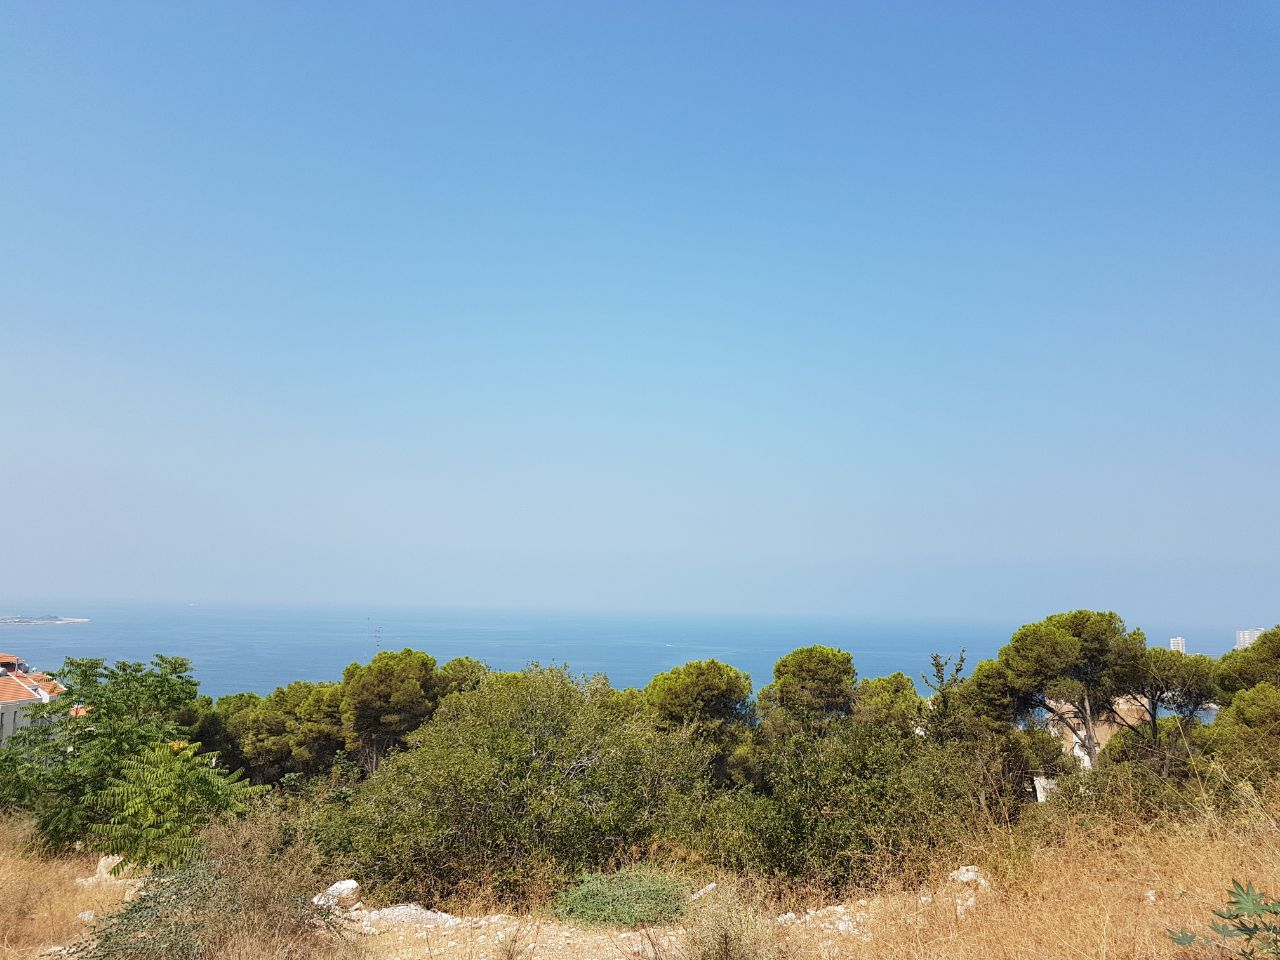 An amazing land with open sea view for sale in Kfarhbab Ghazir Lebanon, buy sell properties in Lebanon Kfarhbab, Real estate in Lebanon Kfarhbab